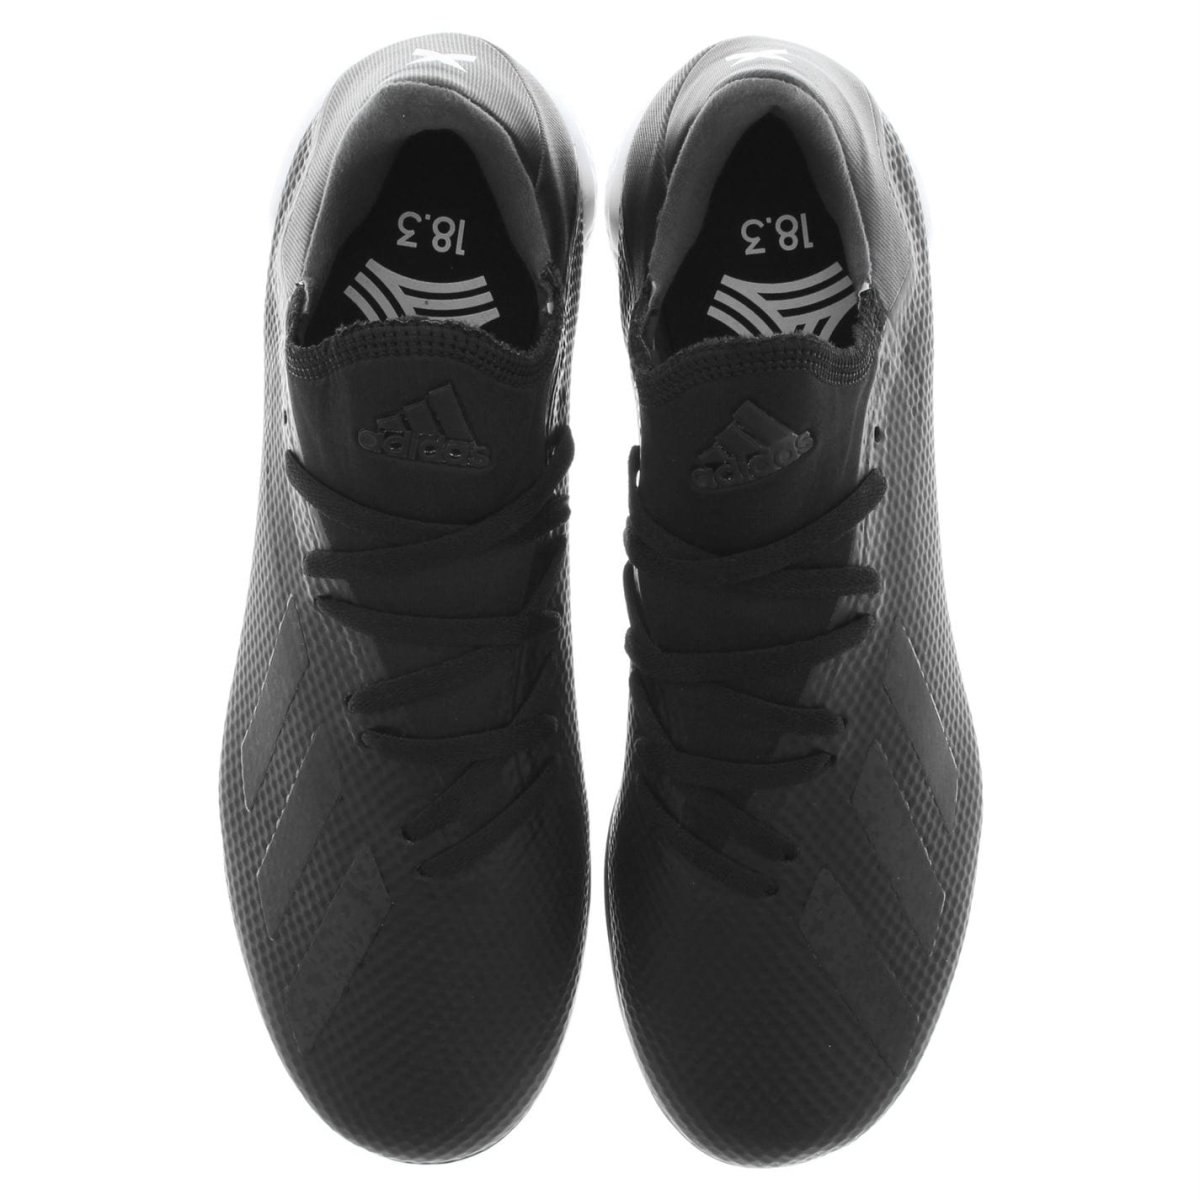 adidas X 18.3 Tango Fußballschuhe Astro Turf AT Herren 3210